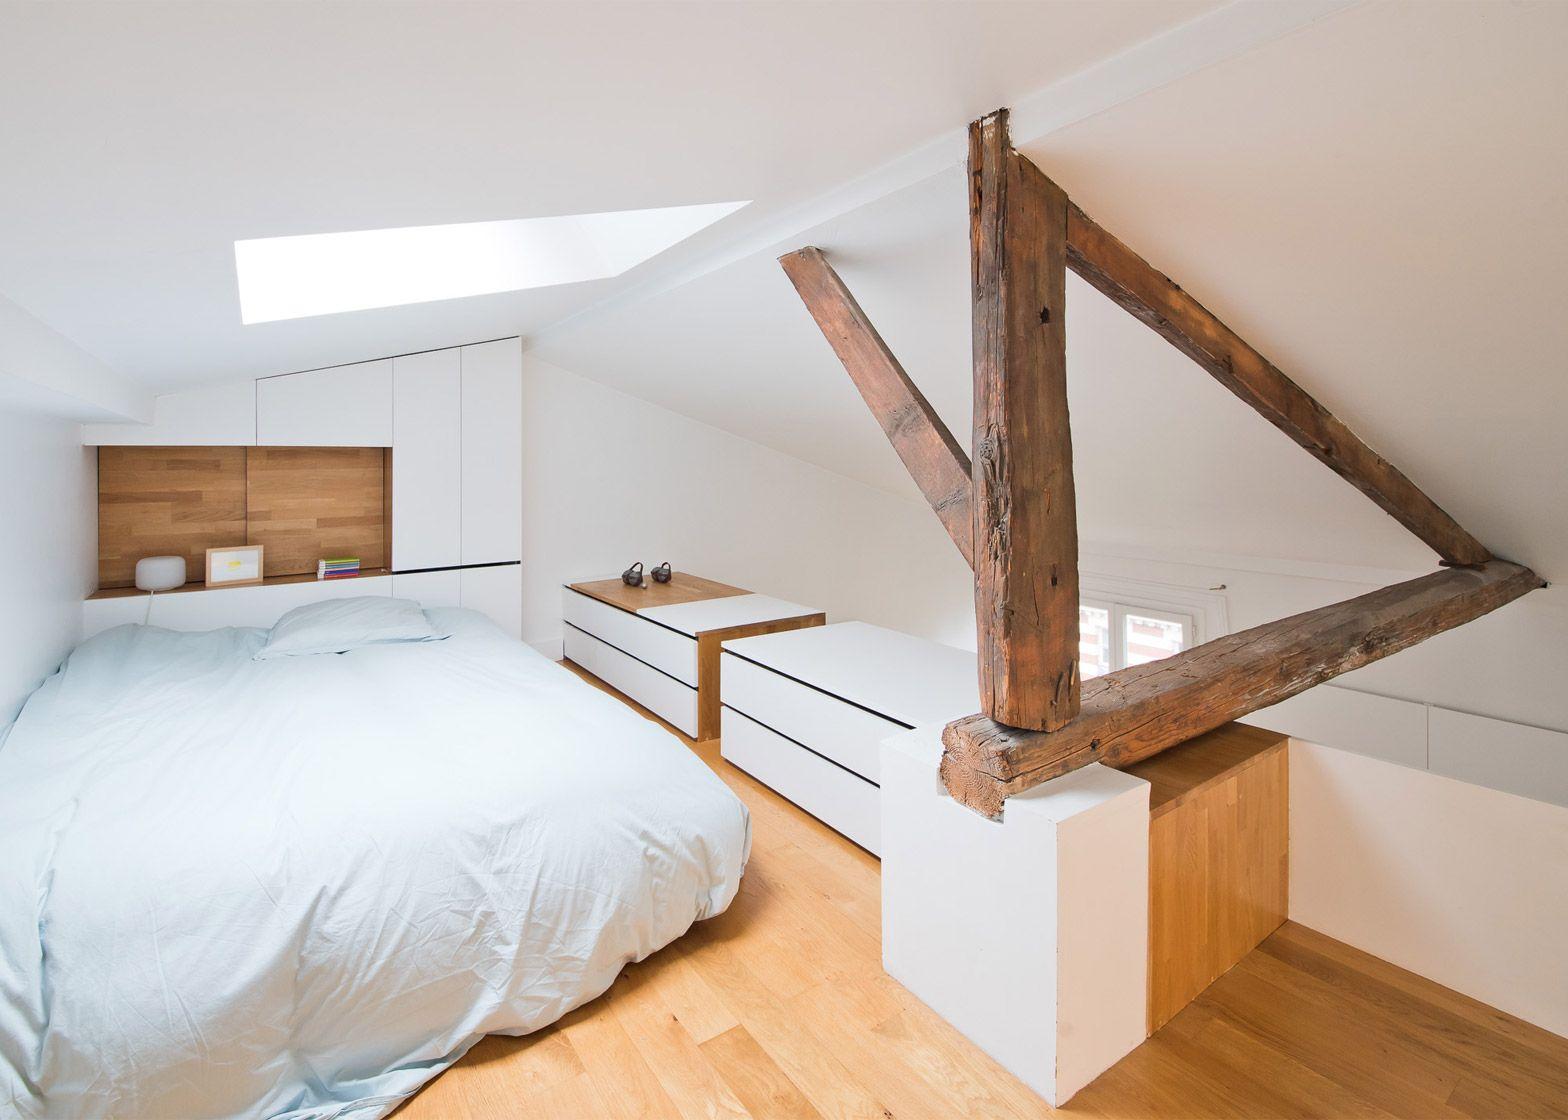 Soppalco Camera Da Letto.Sabo Project Transforms Paris Interior With Space Saving Stairs